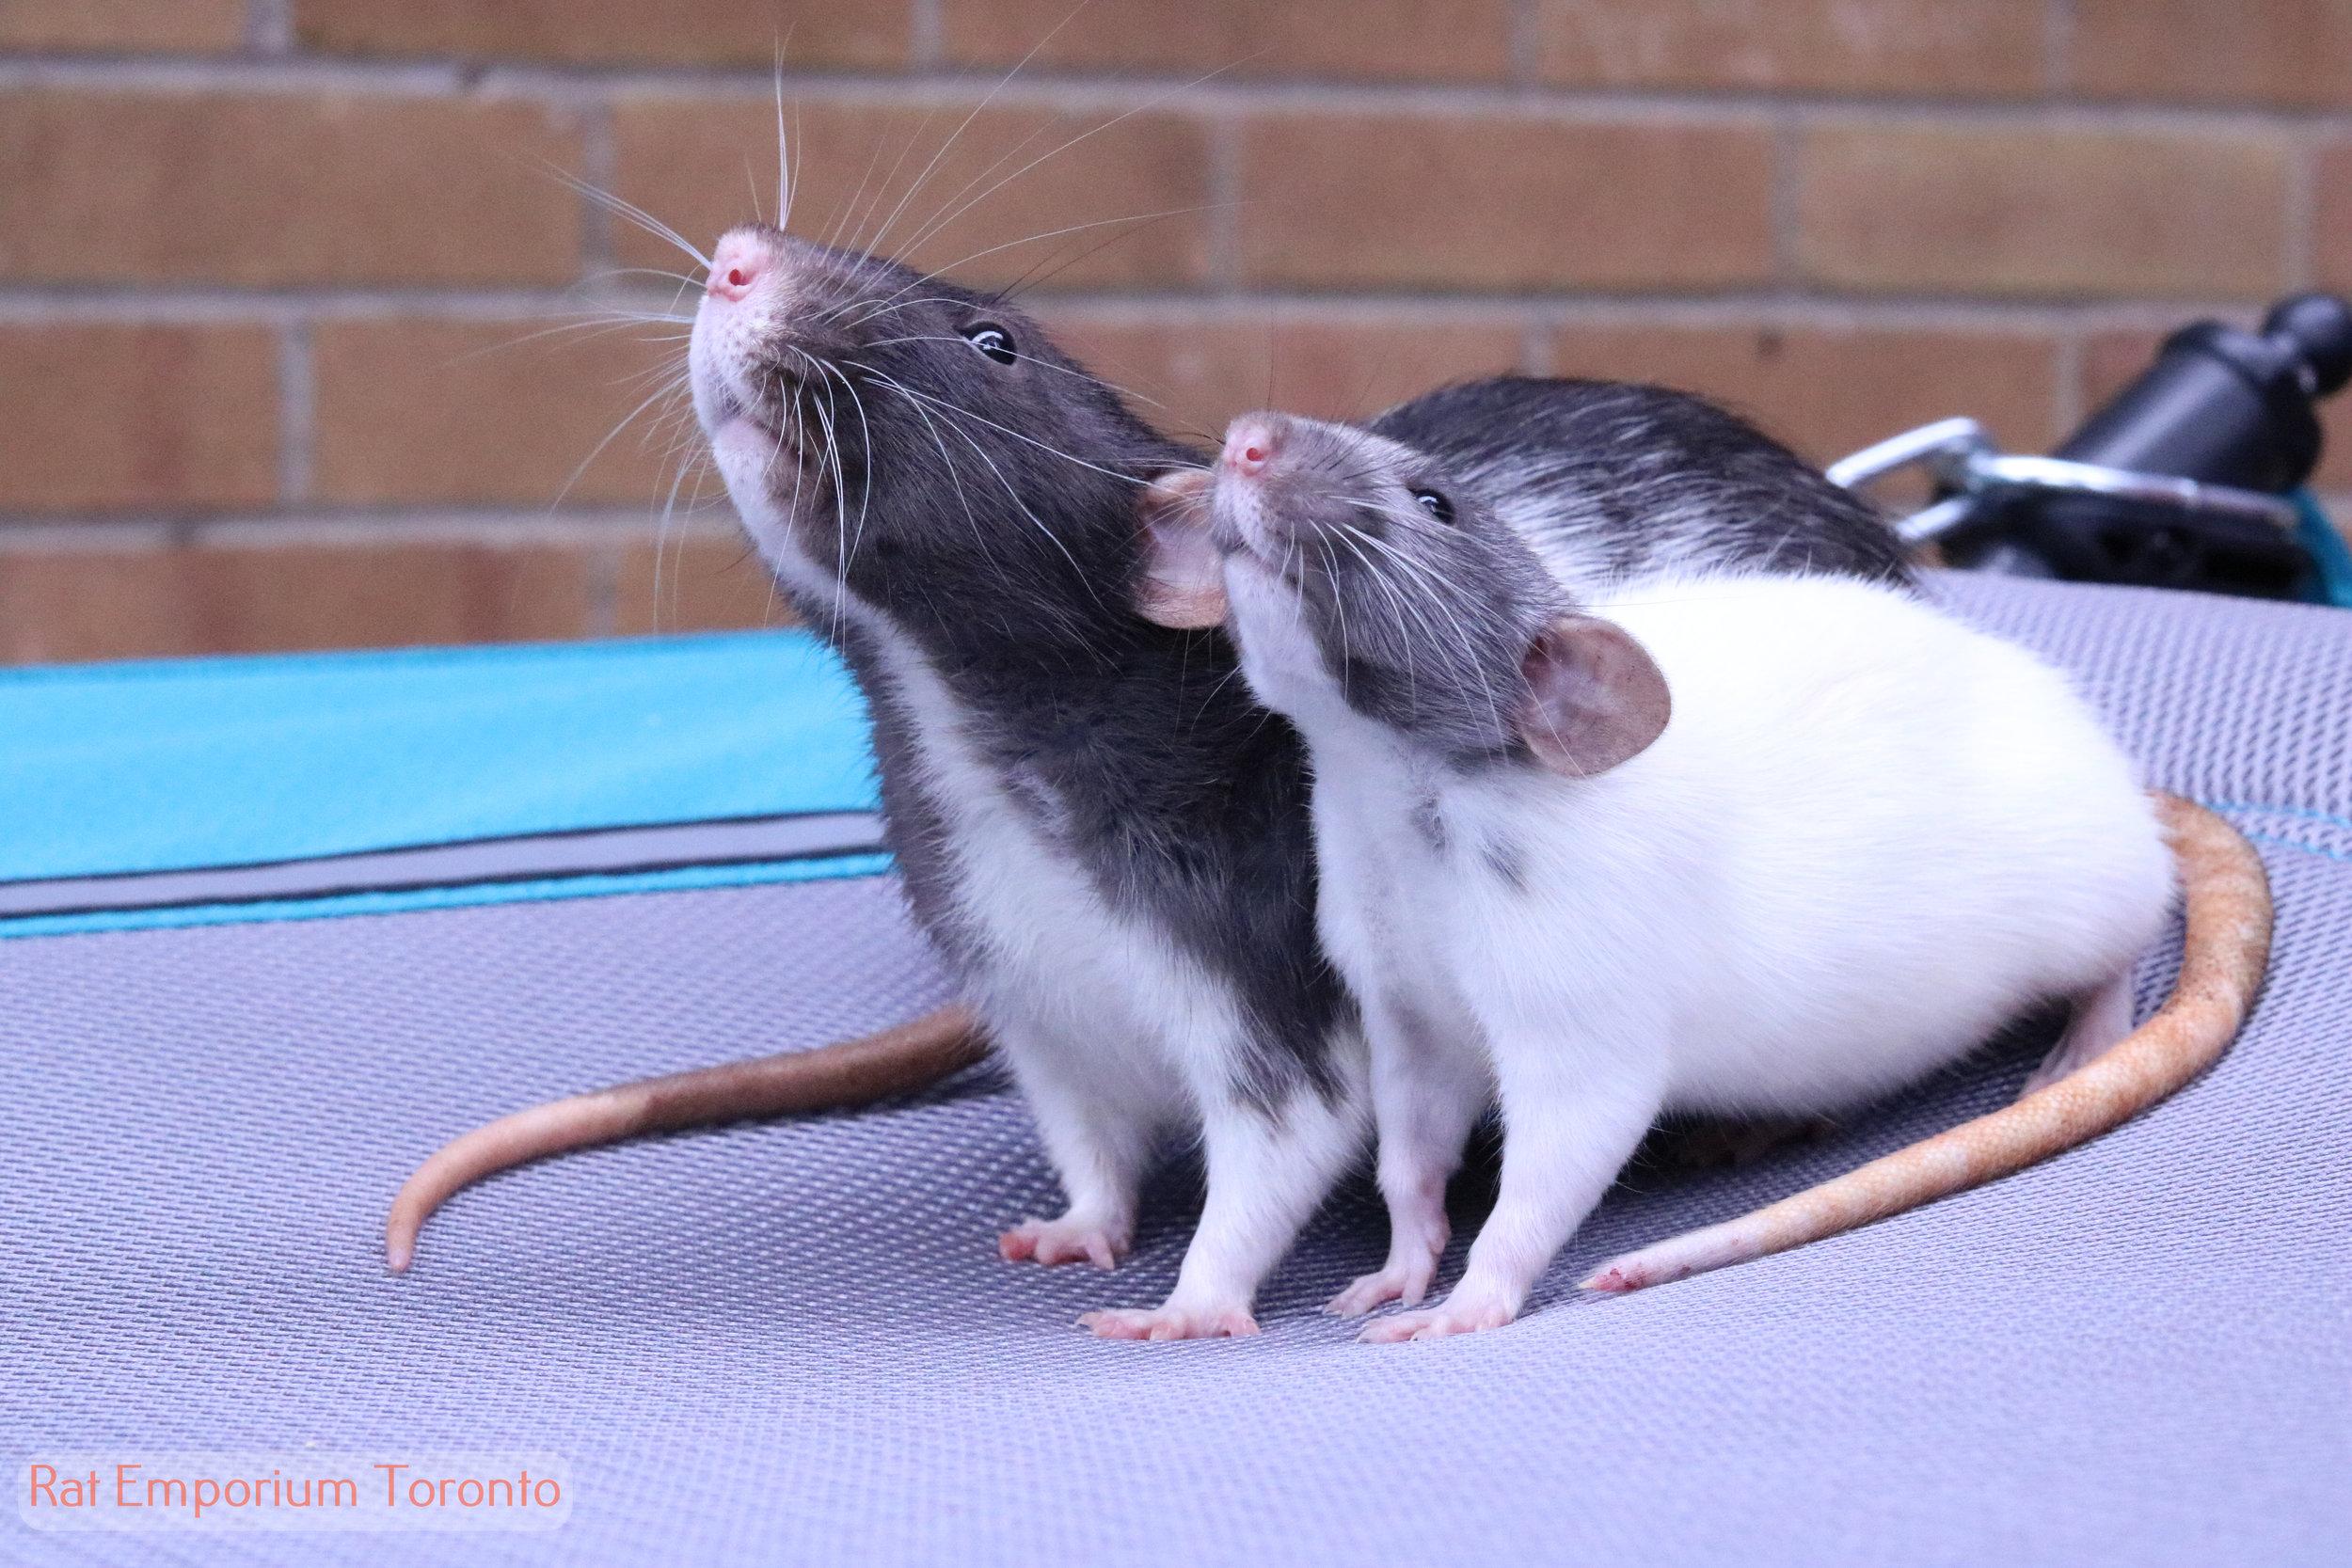 silvermane dumbo rat and black and white dumbo rat - born and raised at Rat Emporium Toronto - adopt pet rats - rat breeder